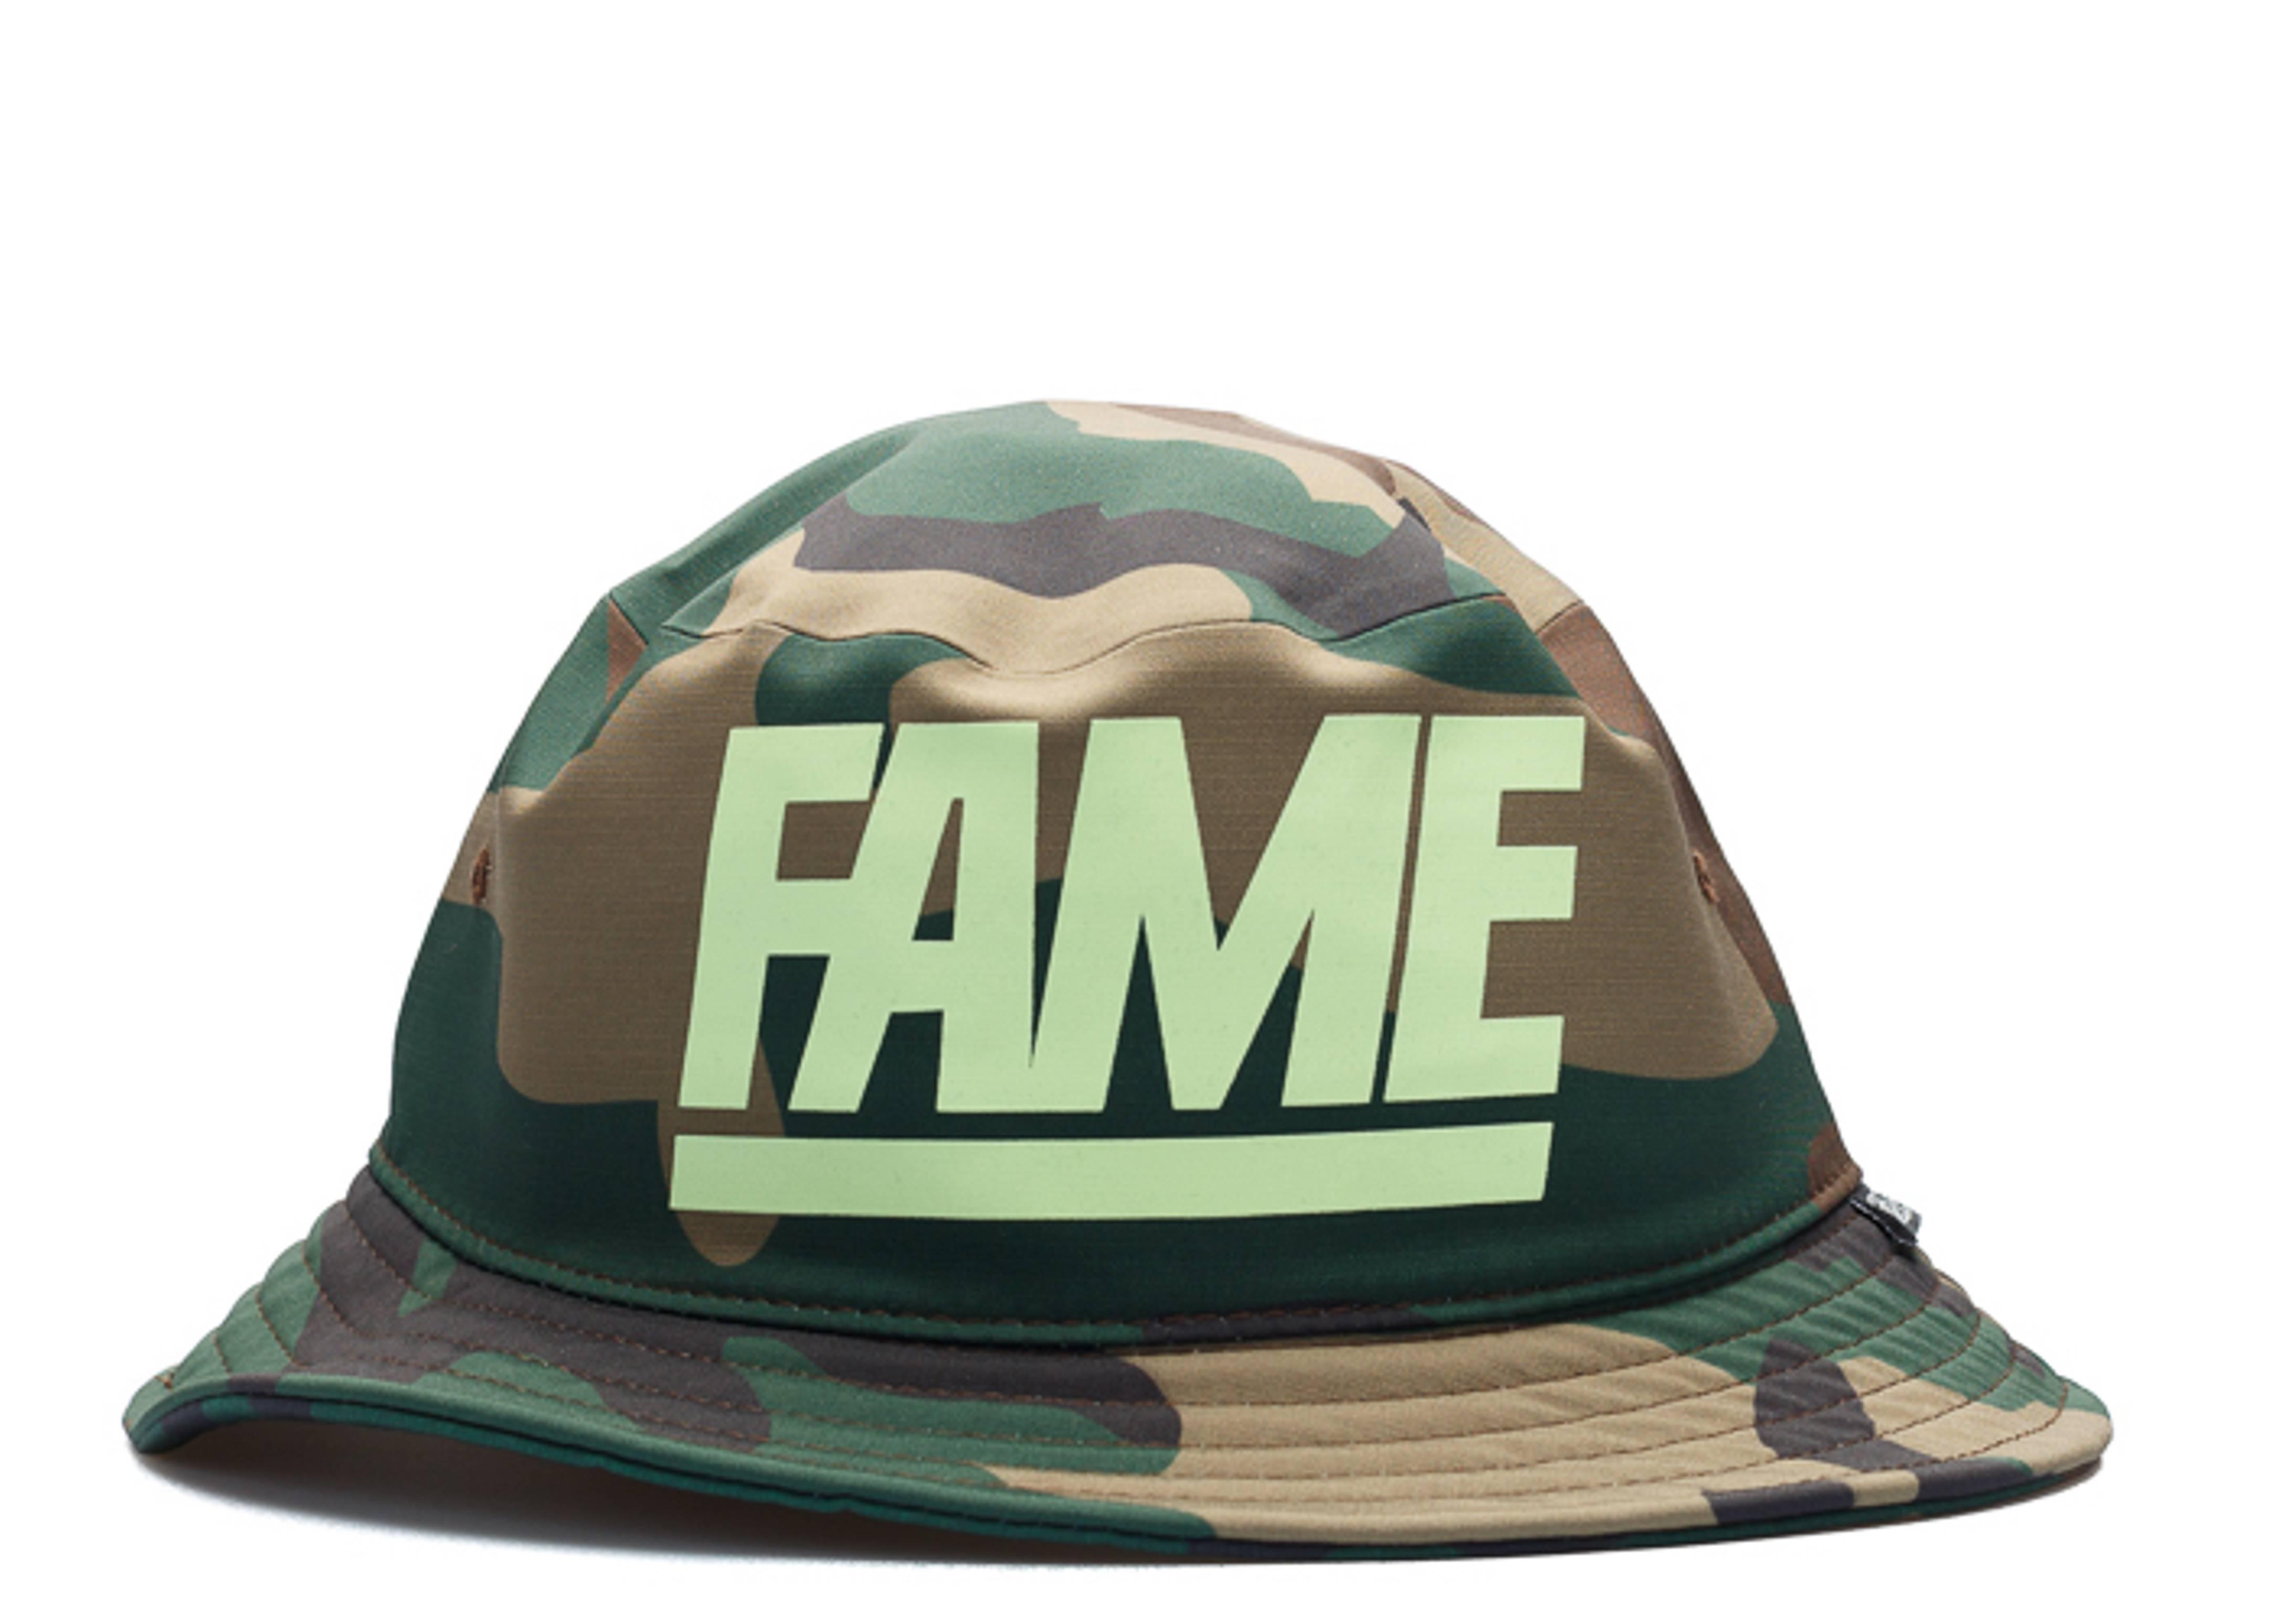 fame block gitd bucket hat